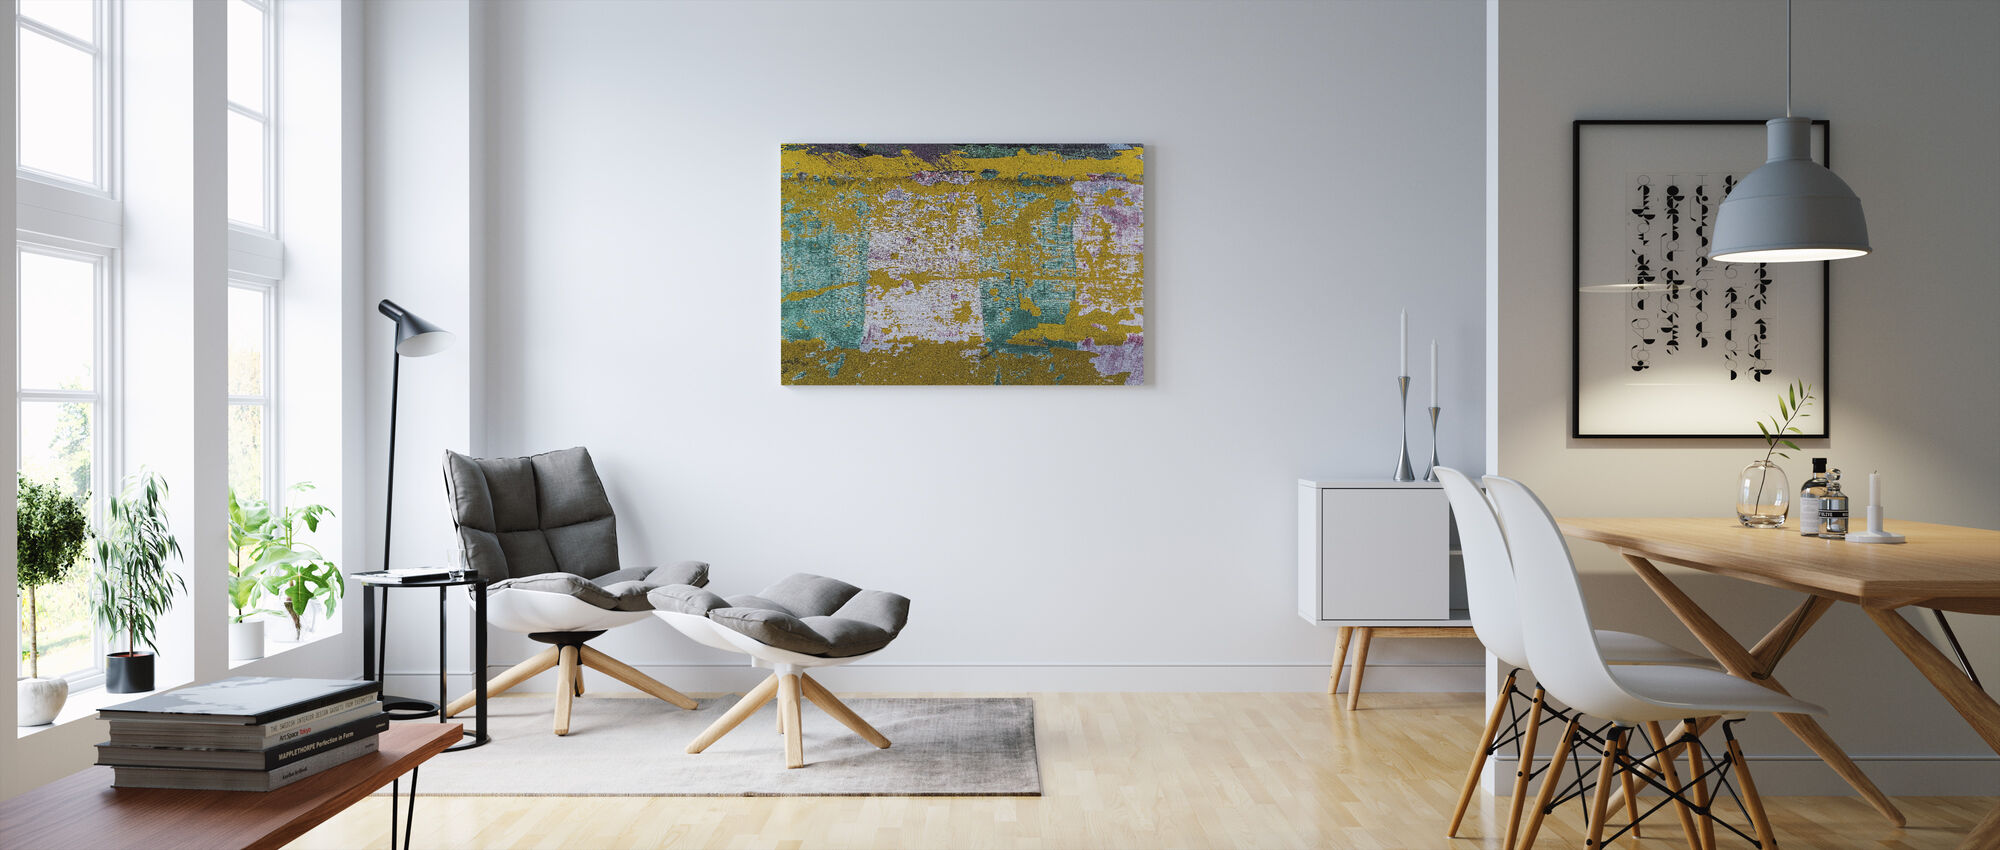 Abstrakt Veggmaling - Lerretsbilde - Stue